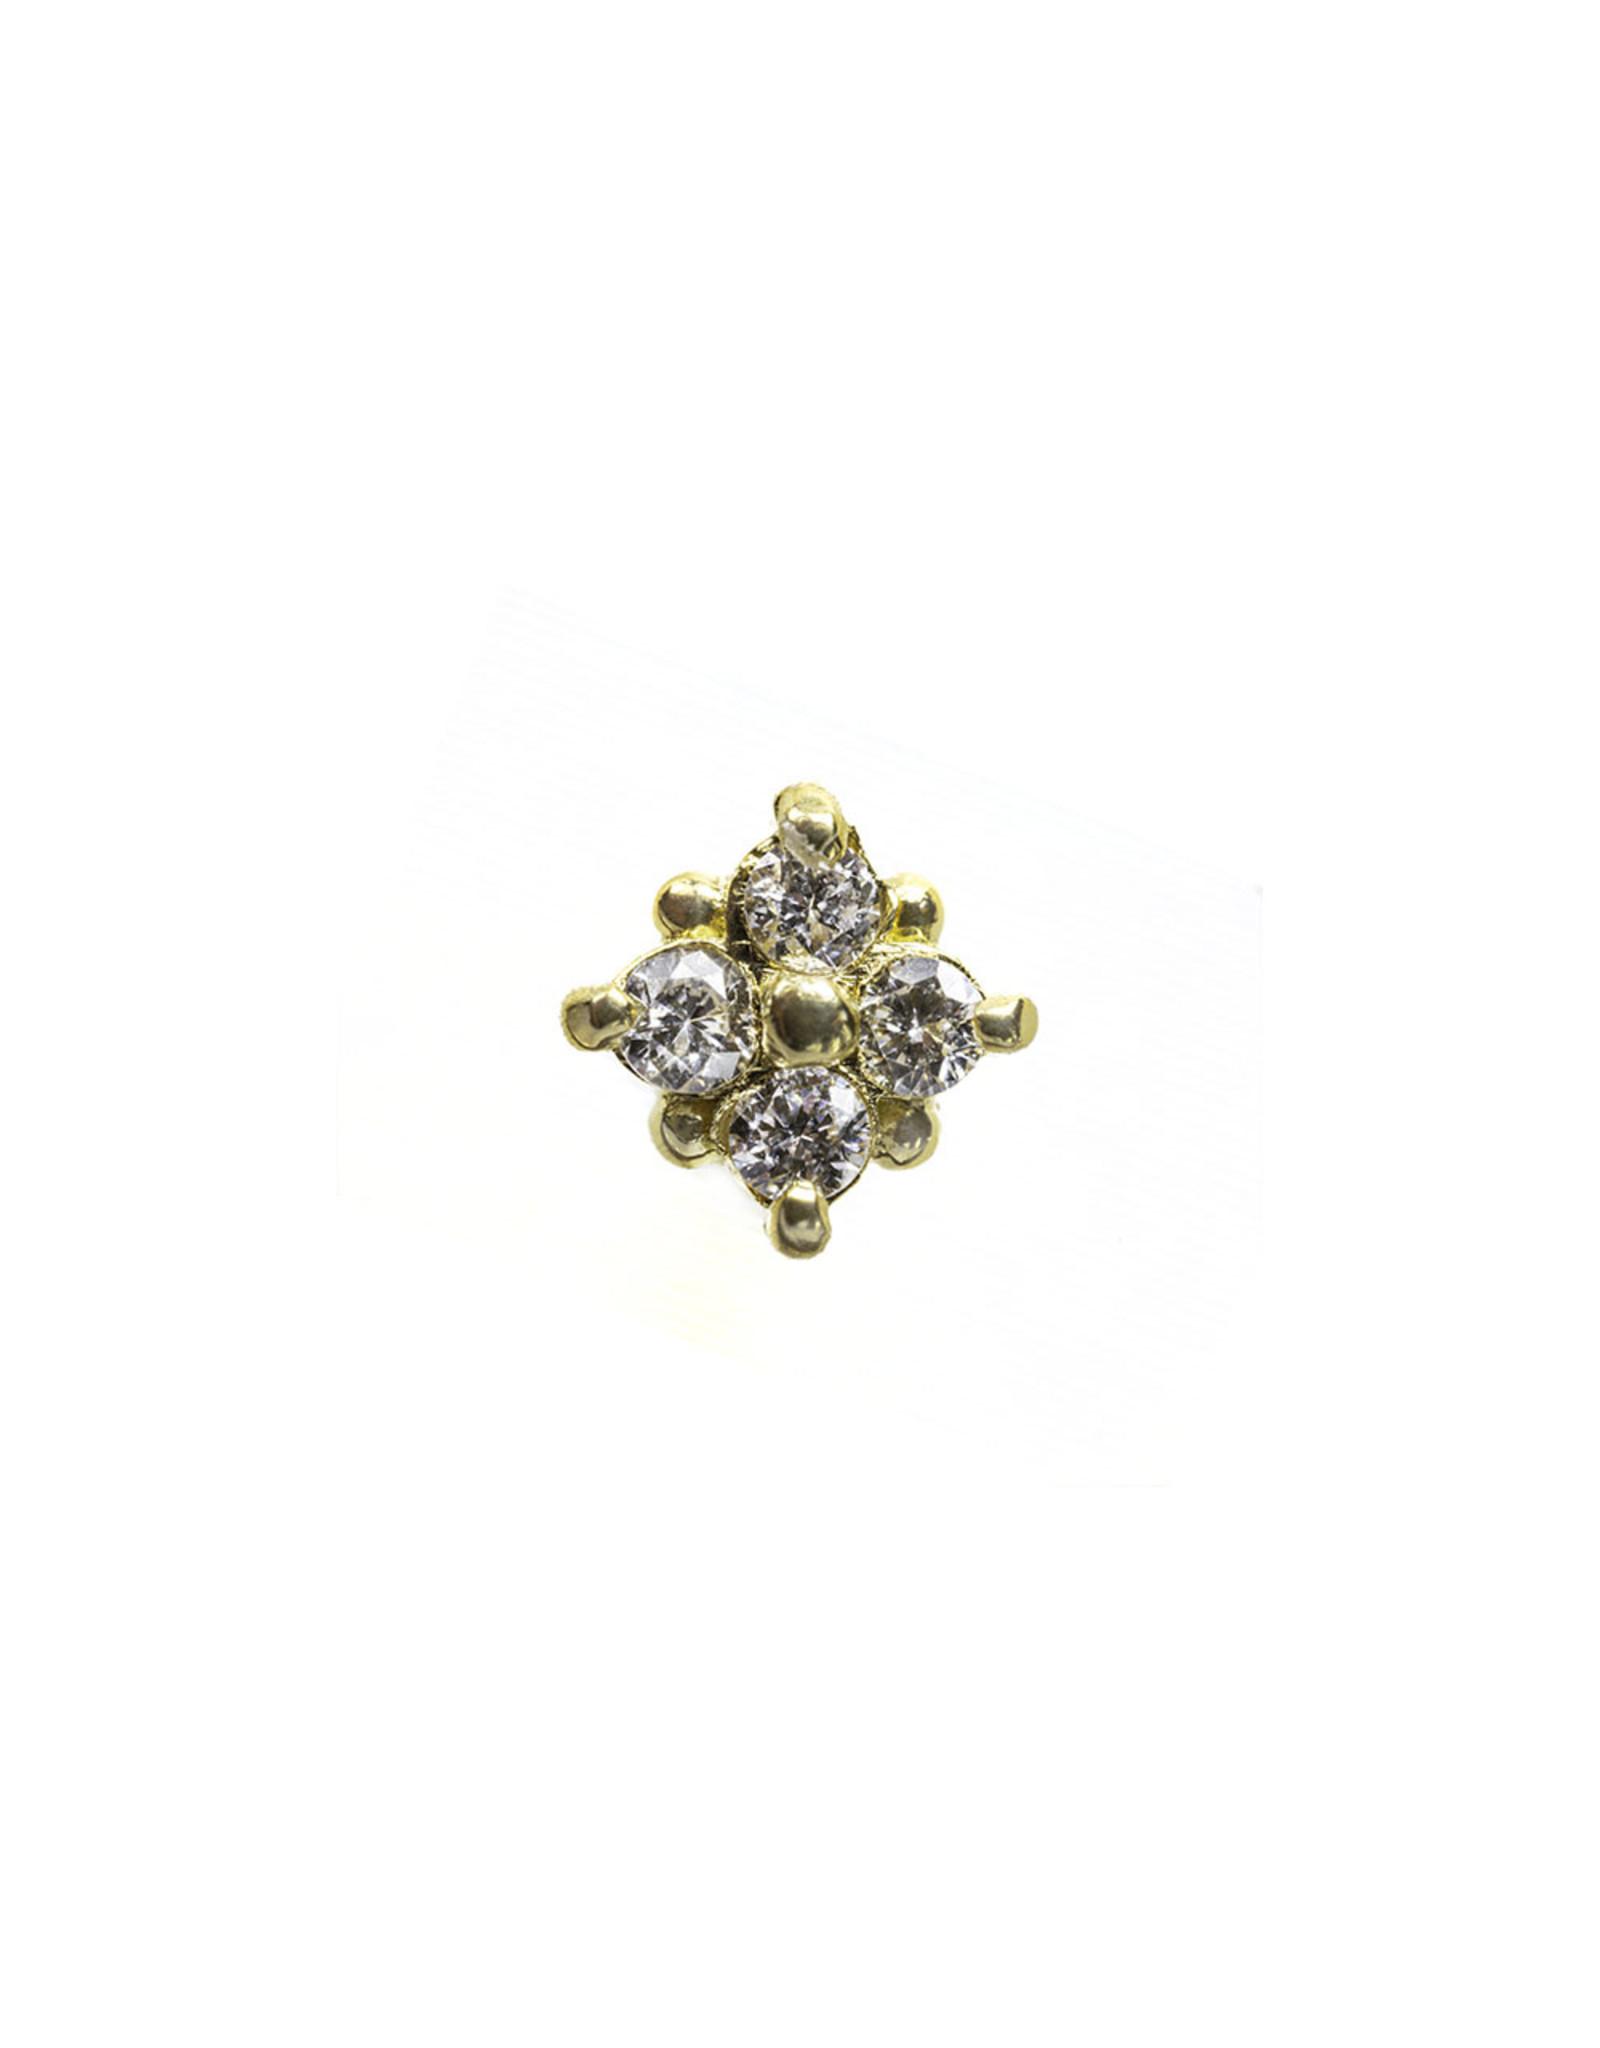 "BVLA BVLA ""Reema"" press fit end with 4x  VS1 Diamond"